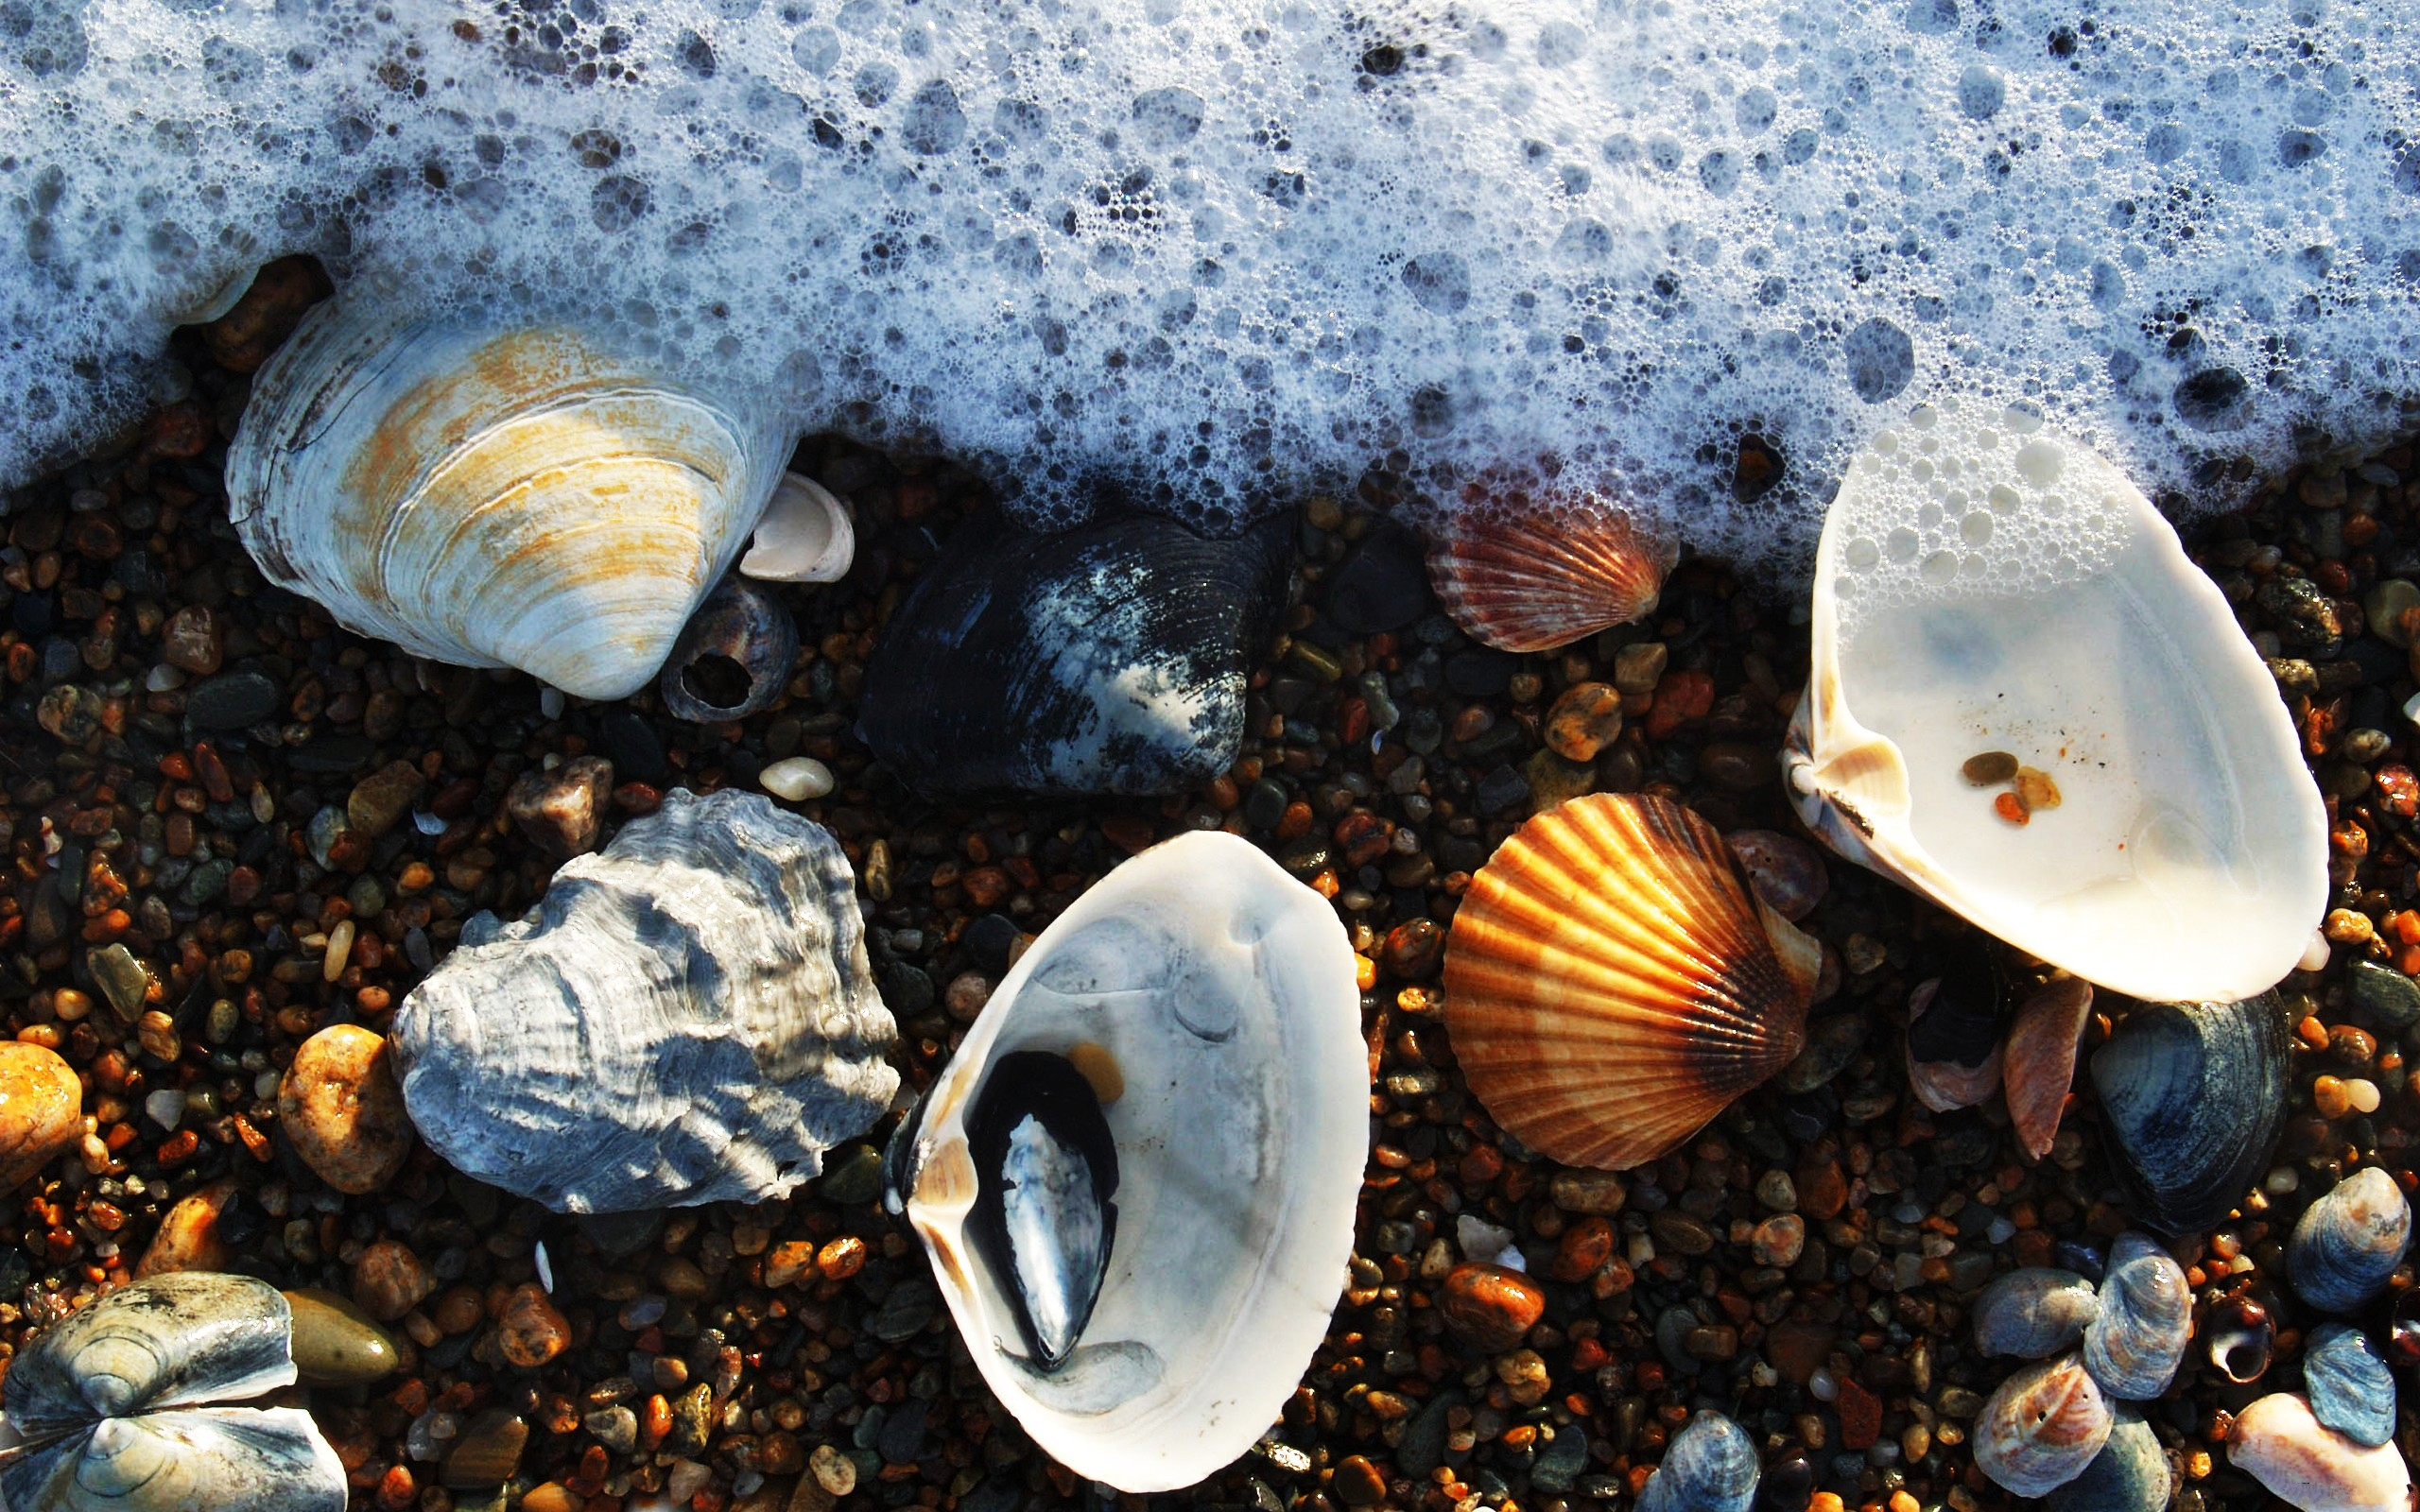 Февраля, картинки на рабочий стол ракушки и море